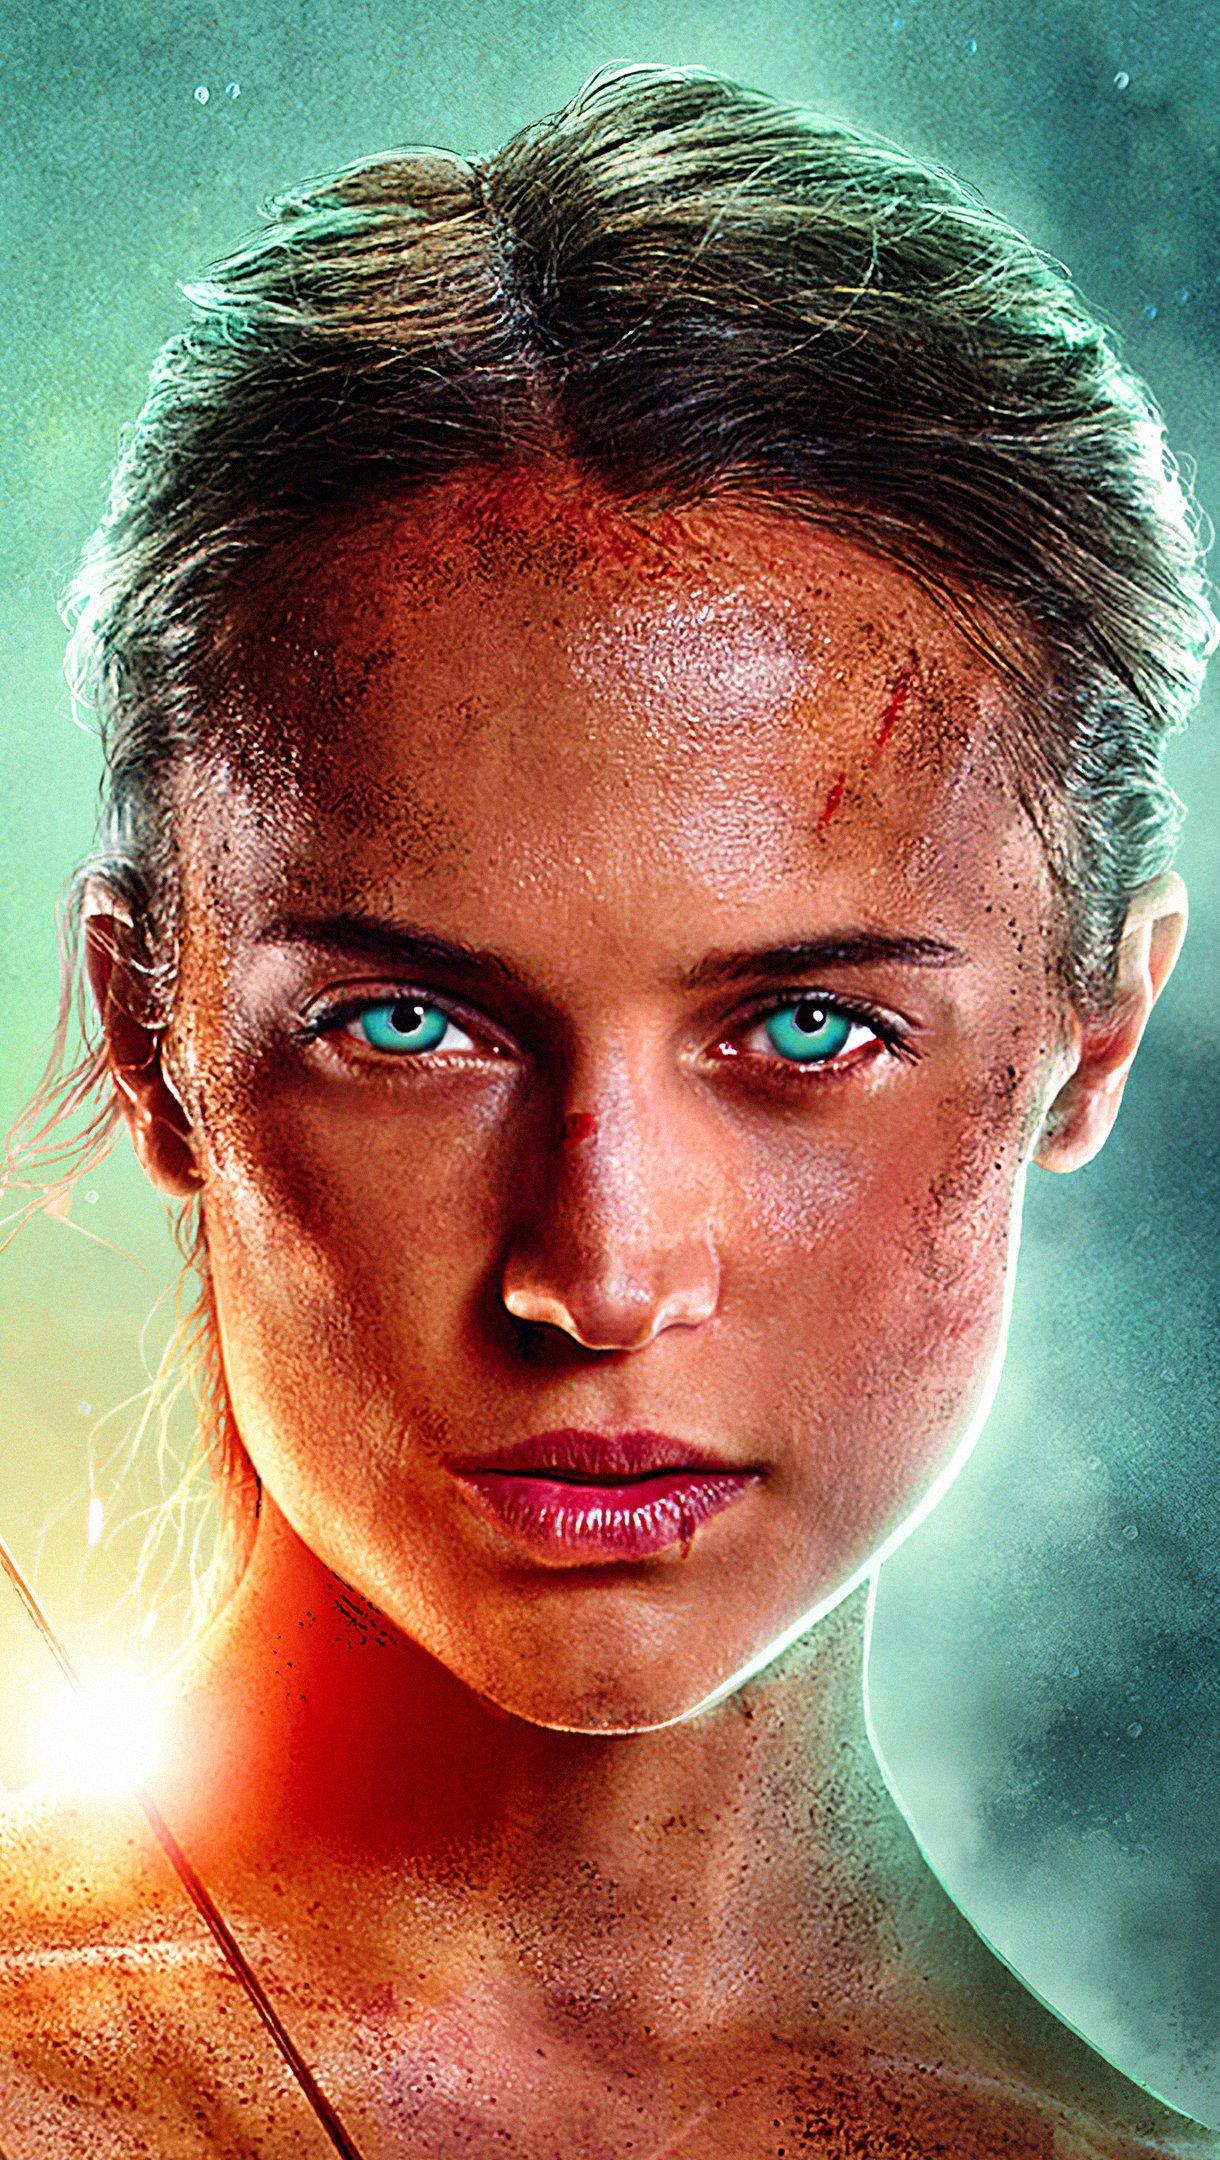 Wallpaper Lara Croft: Tomb Raider Vertical